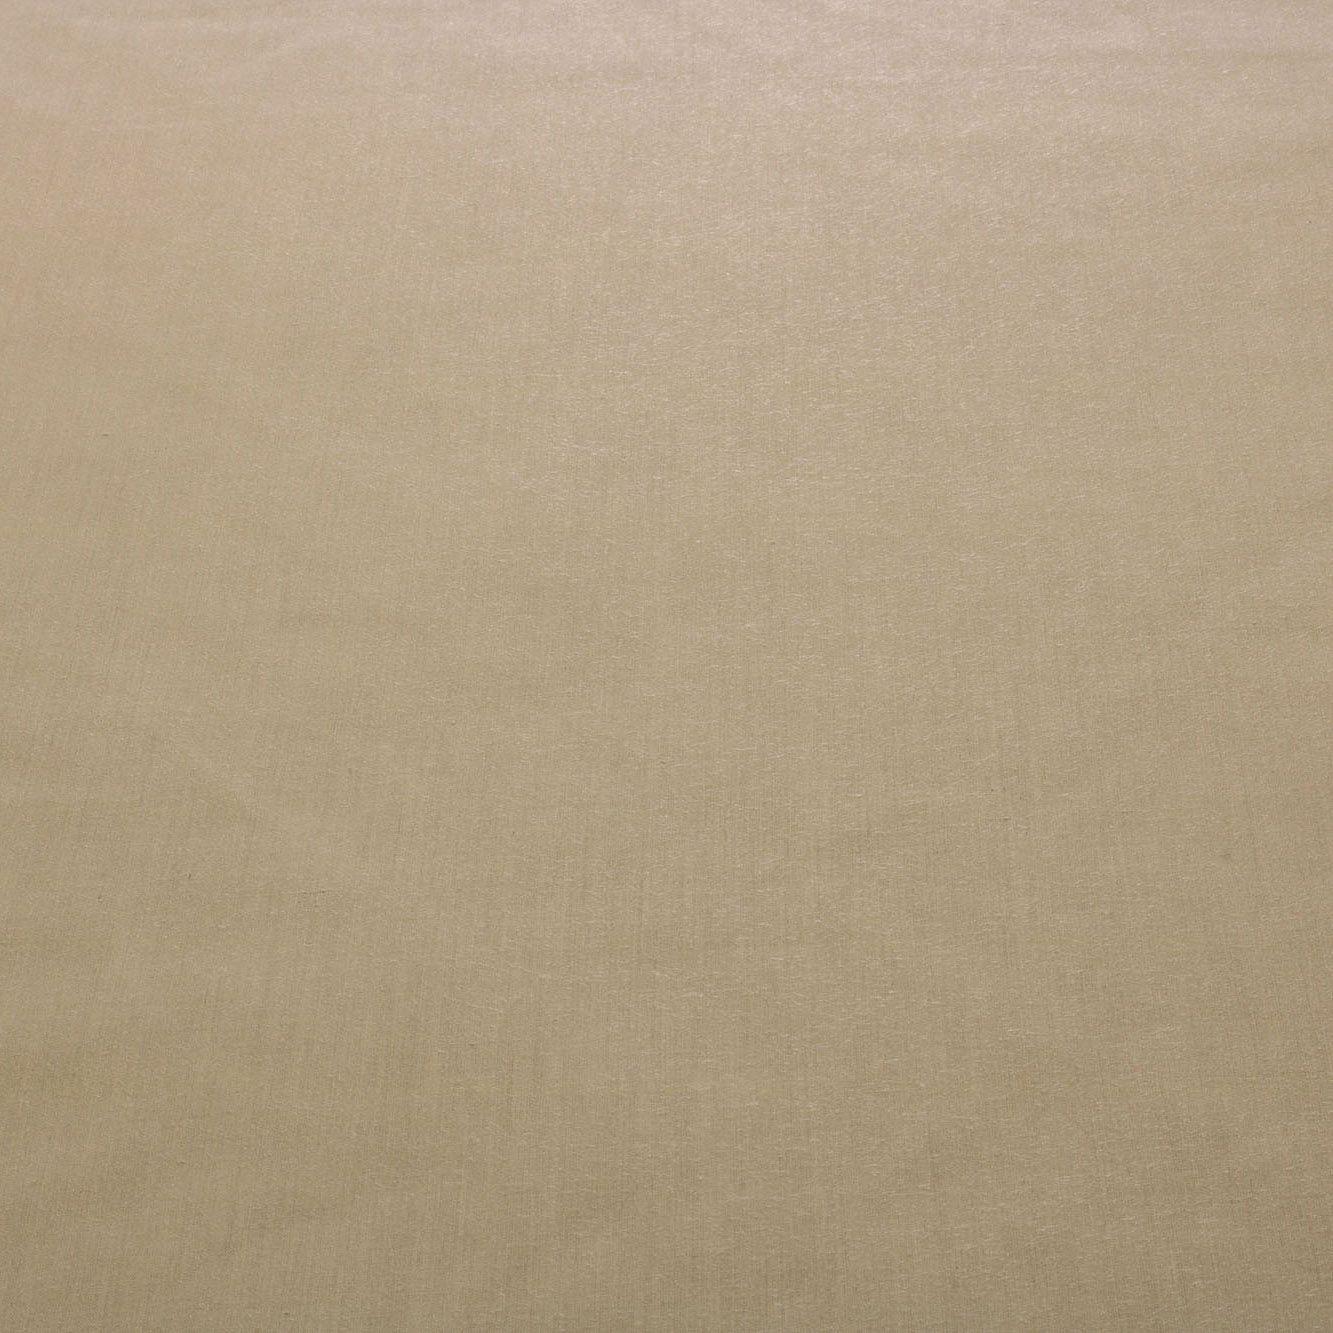 Tecido Tricoline Cinza Claro 100% Algodao 1,50 m Largura